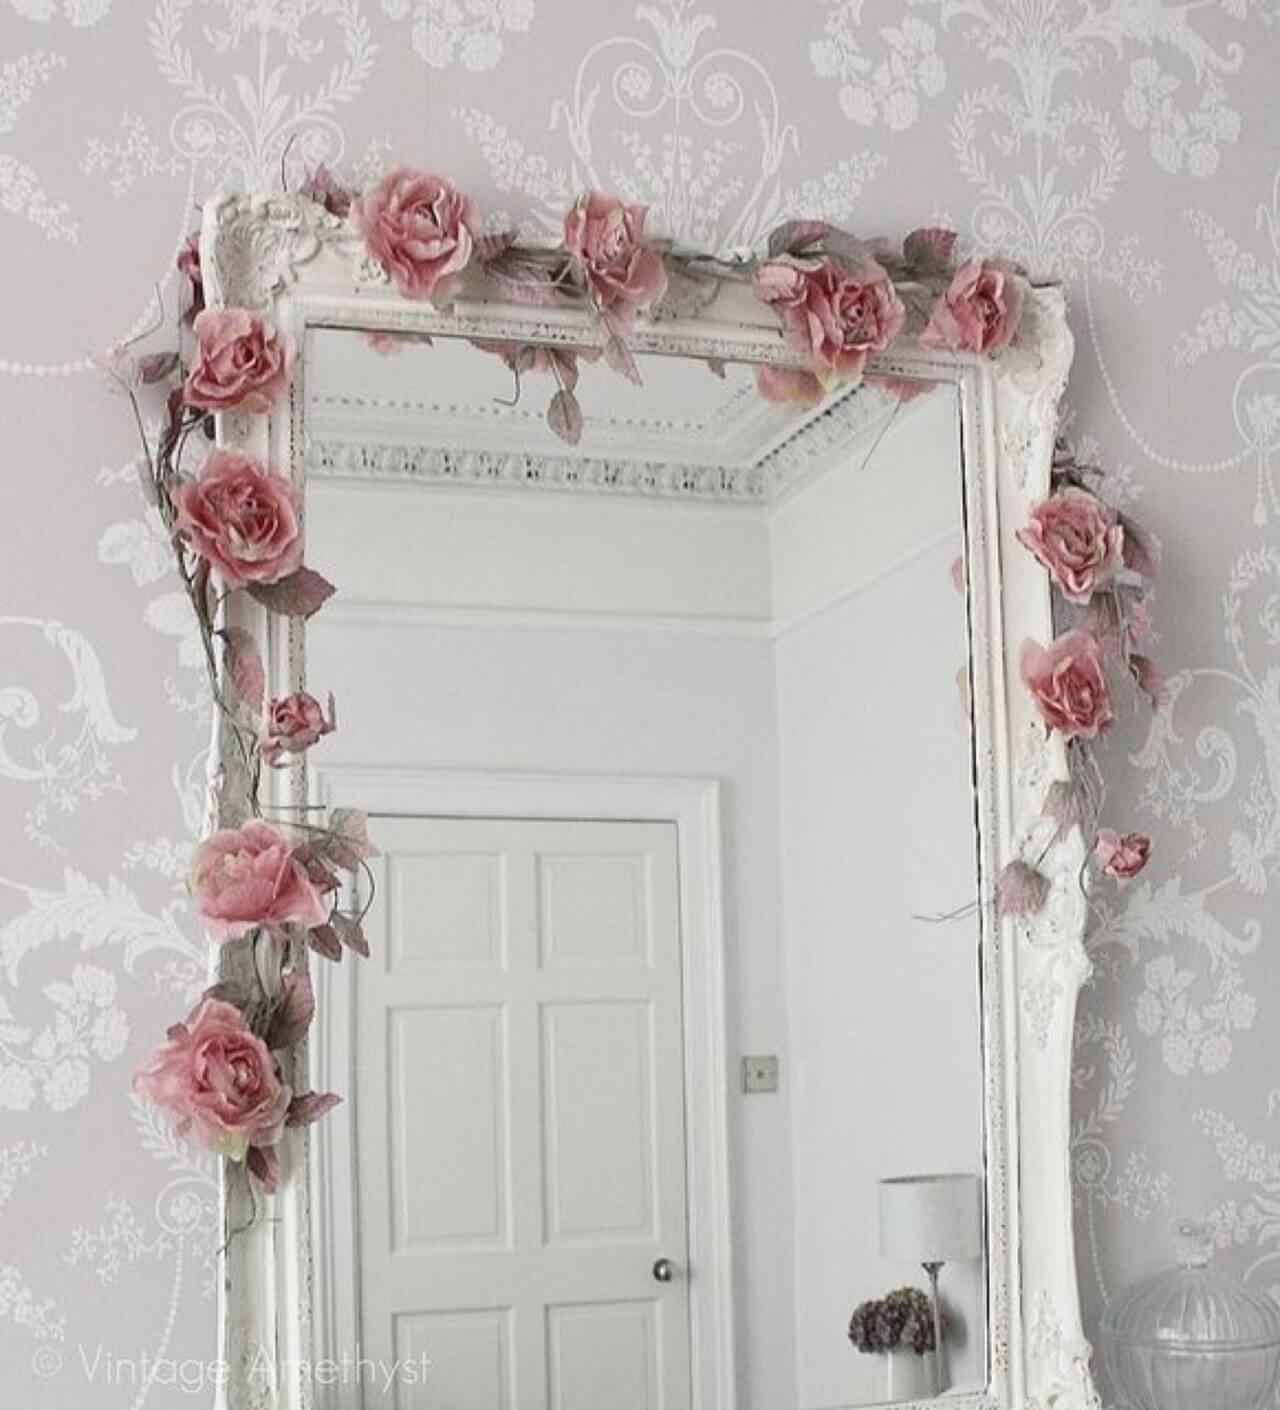 Romantic Bedroom Decor: 25+ Best Romantic Bedroom Decor Ideas And Designs For 2017